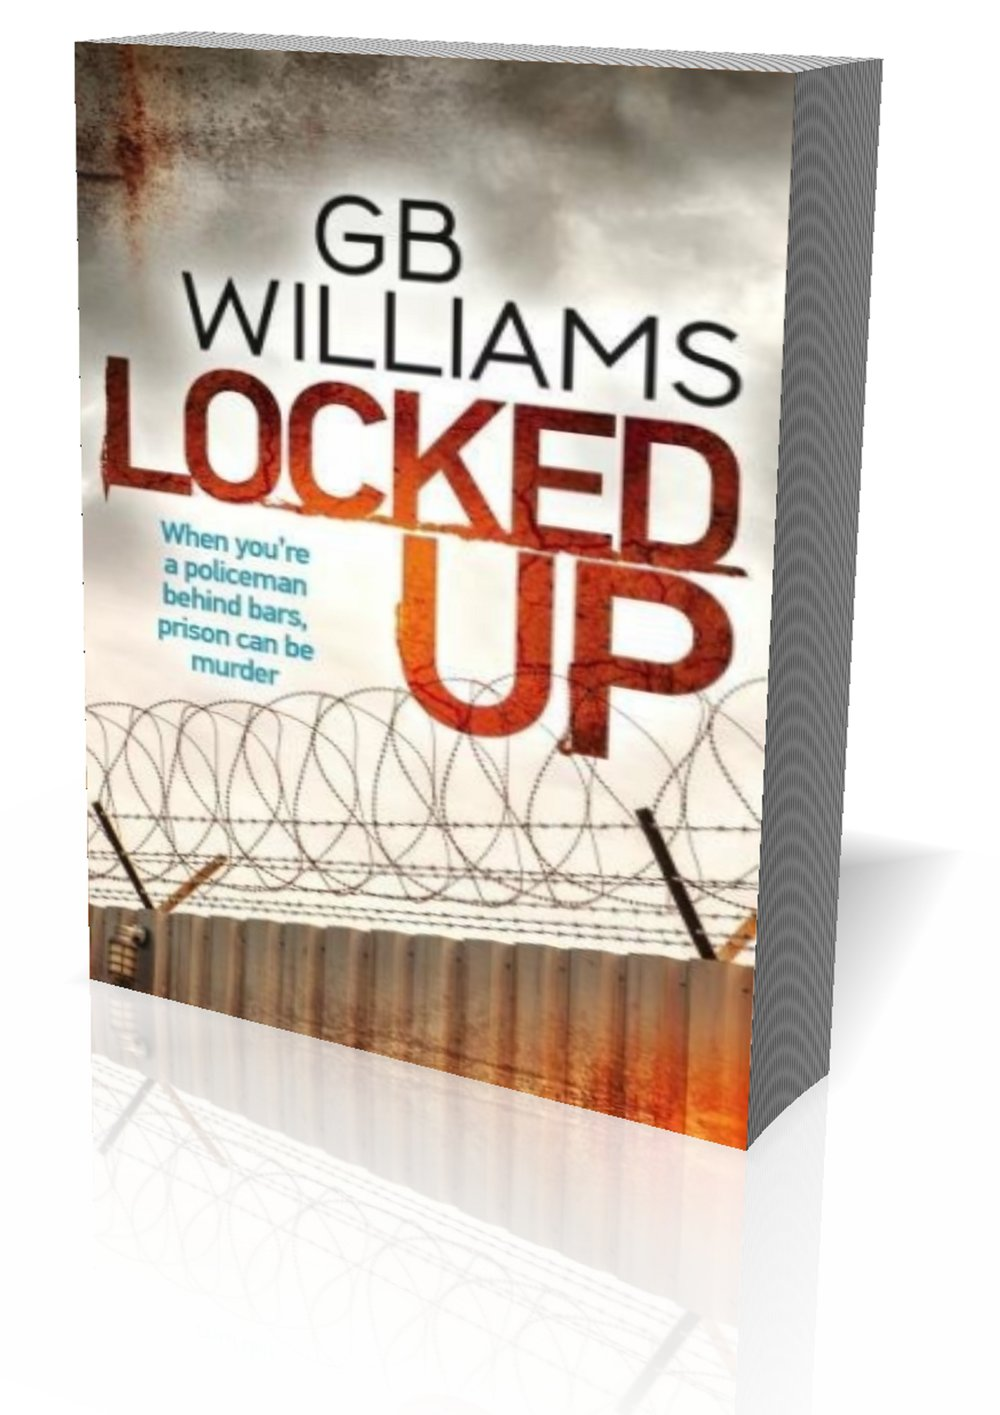 LockedUp.jpg